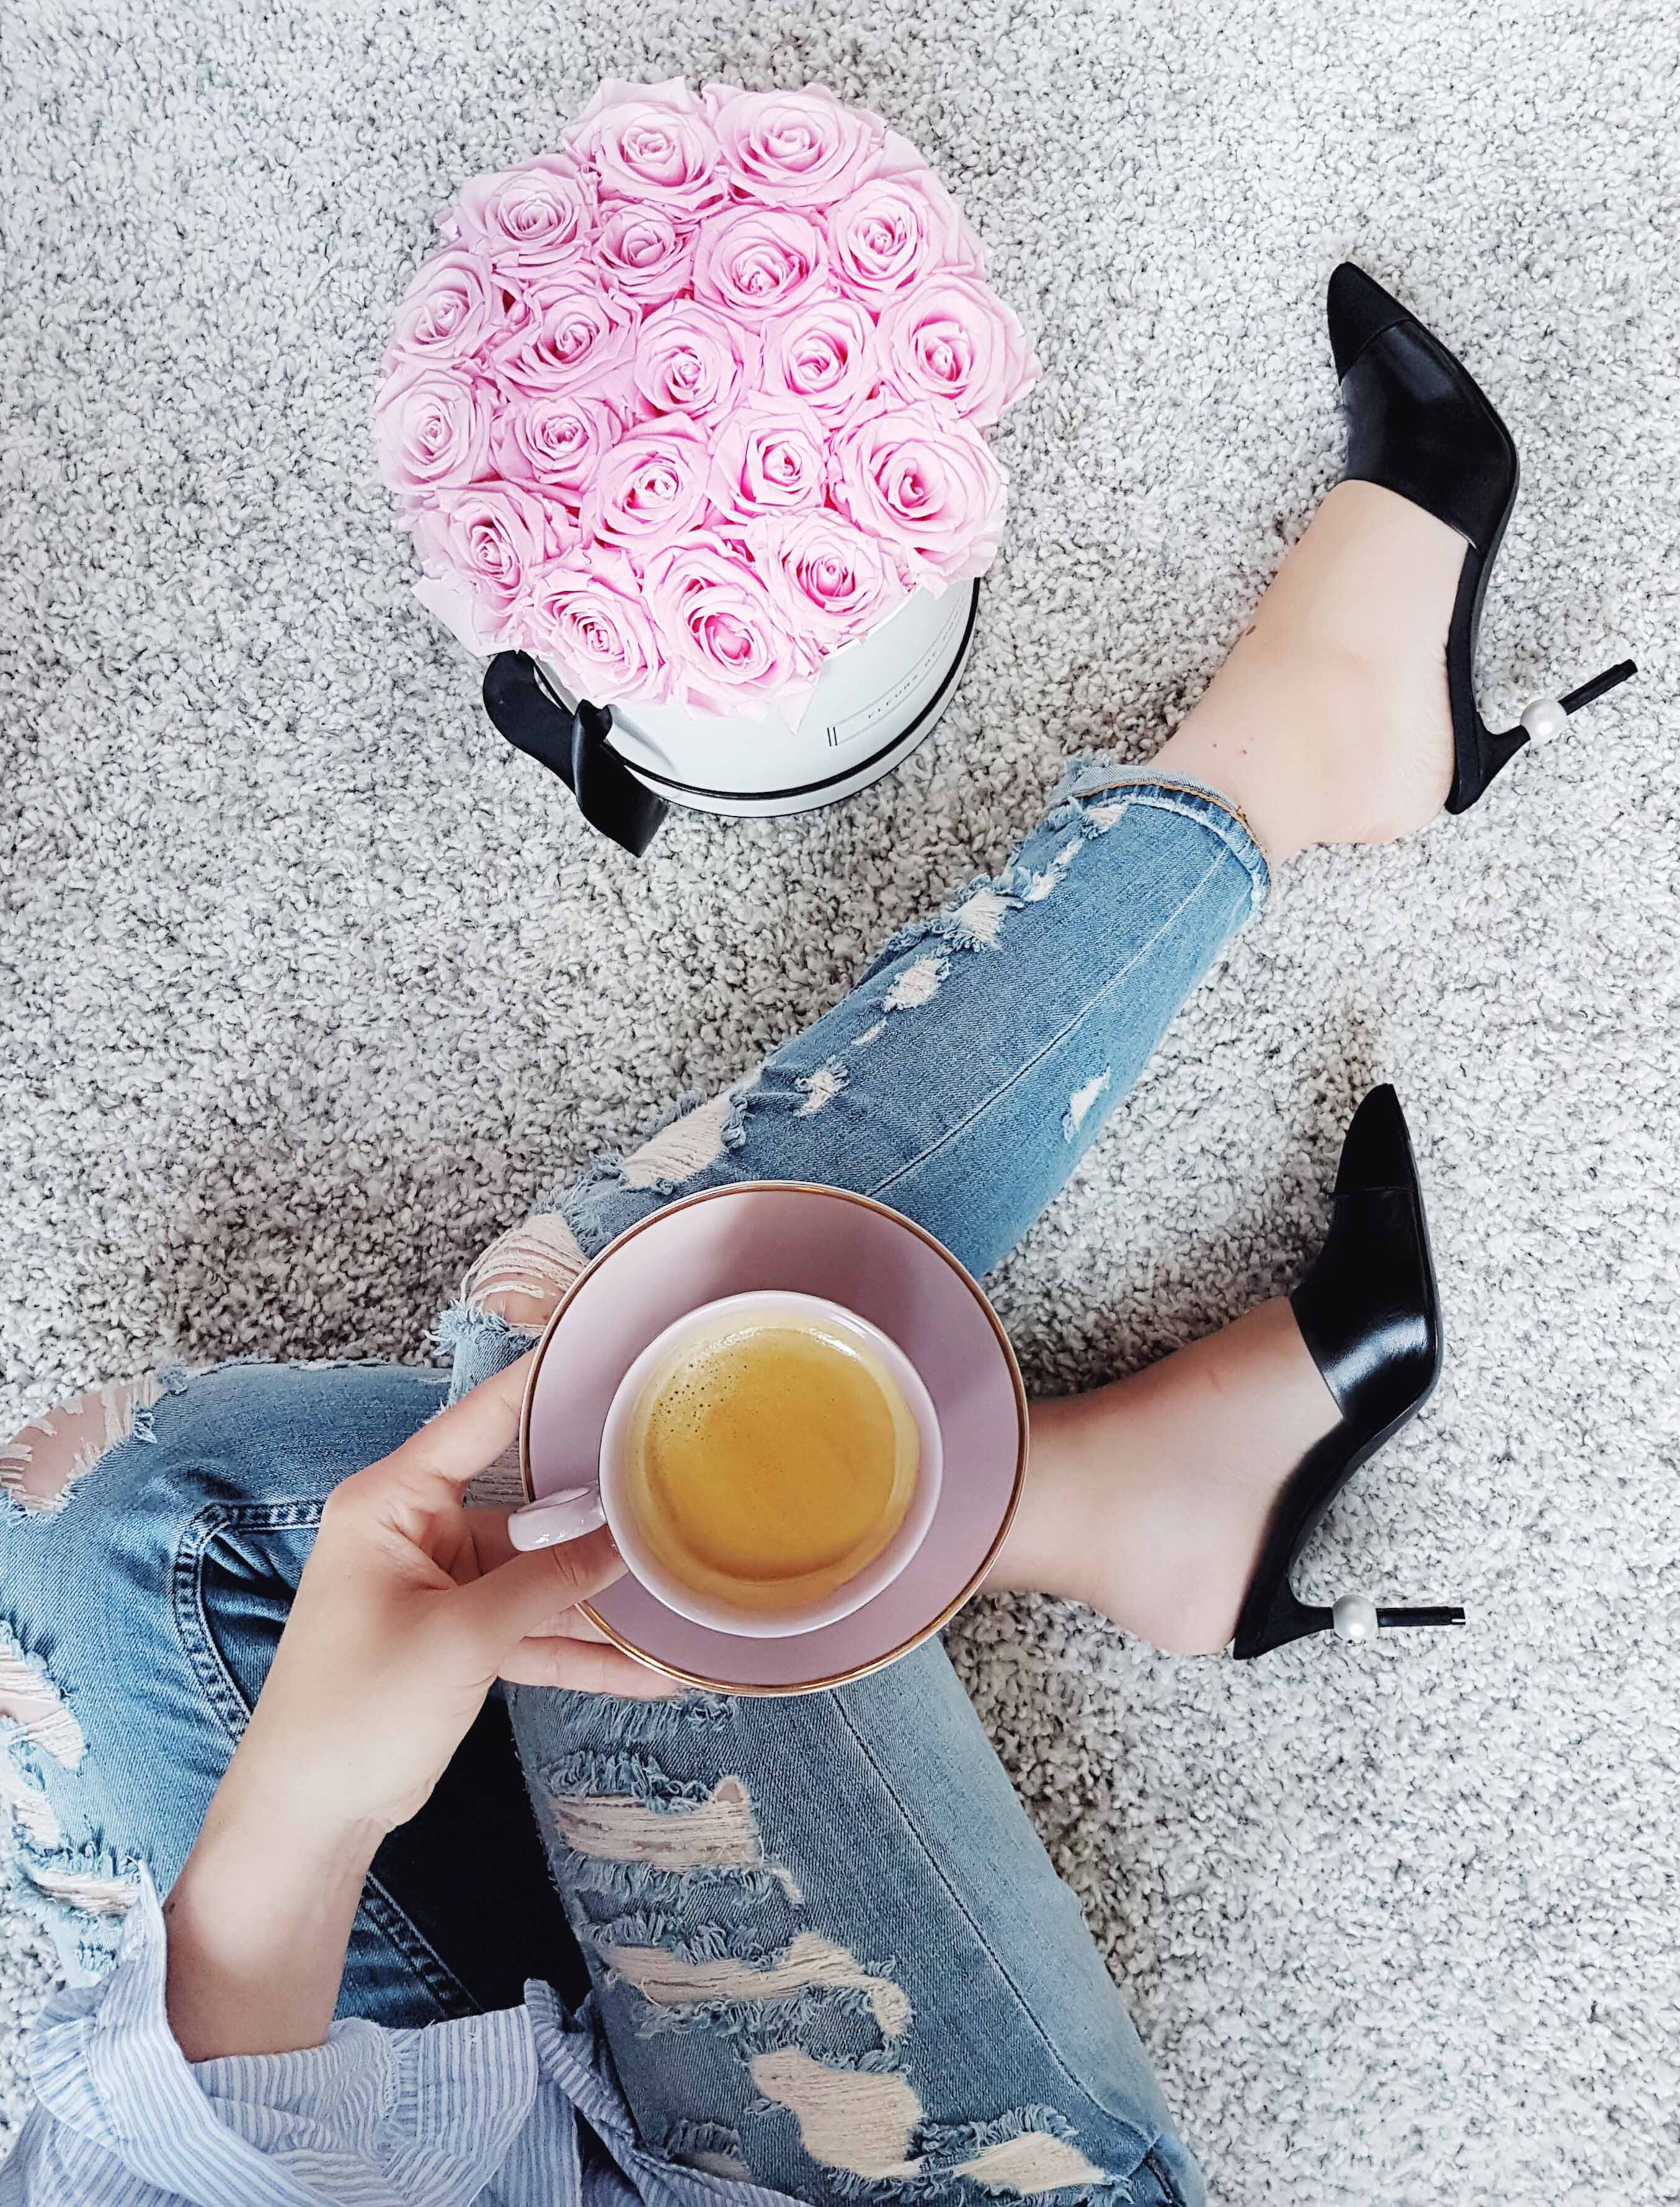 zukkerme_chanel_rosen_coffeeinspiration_zara